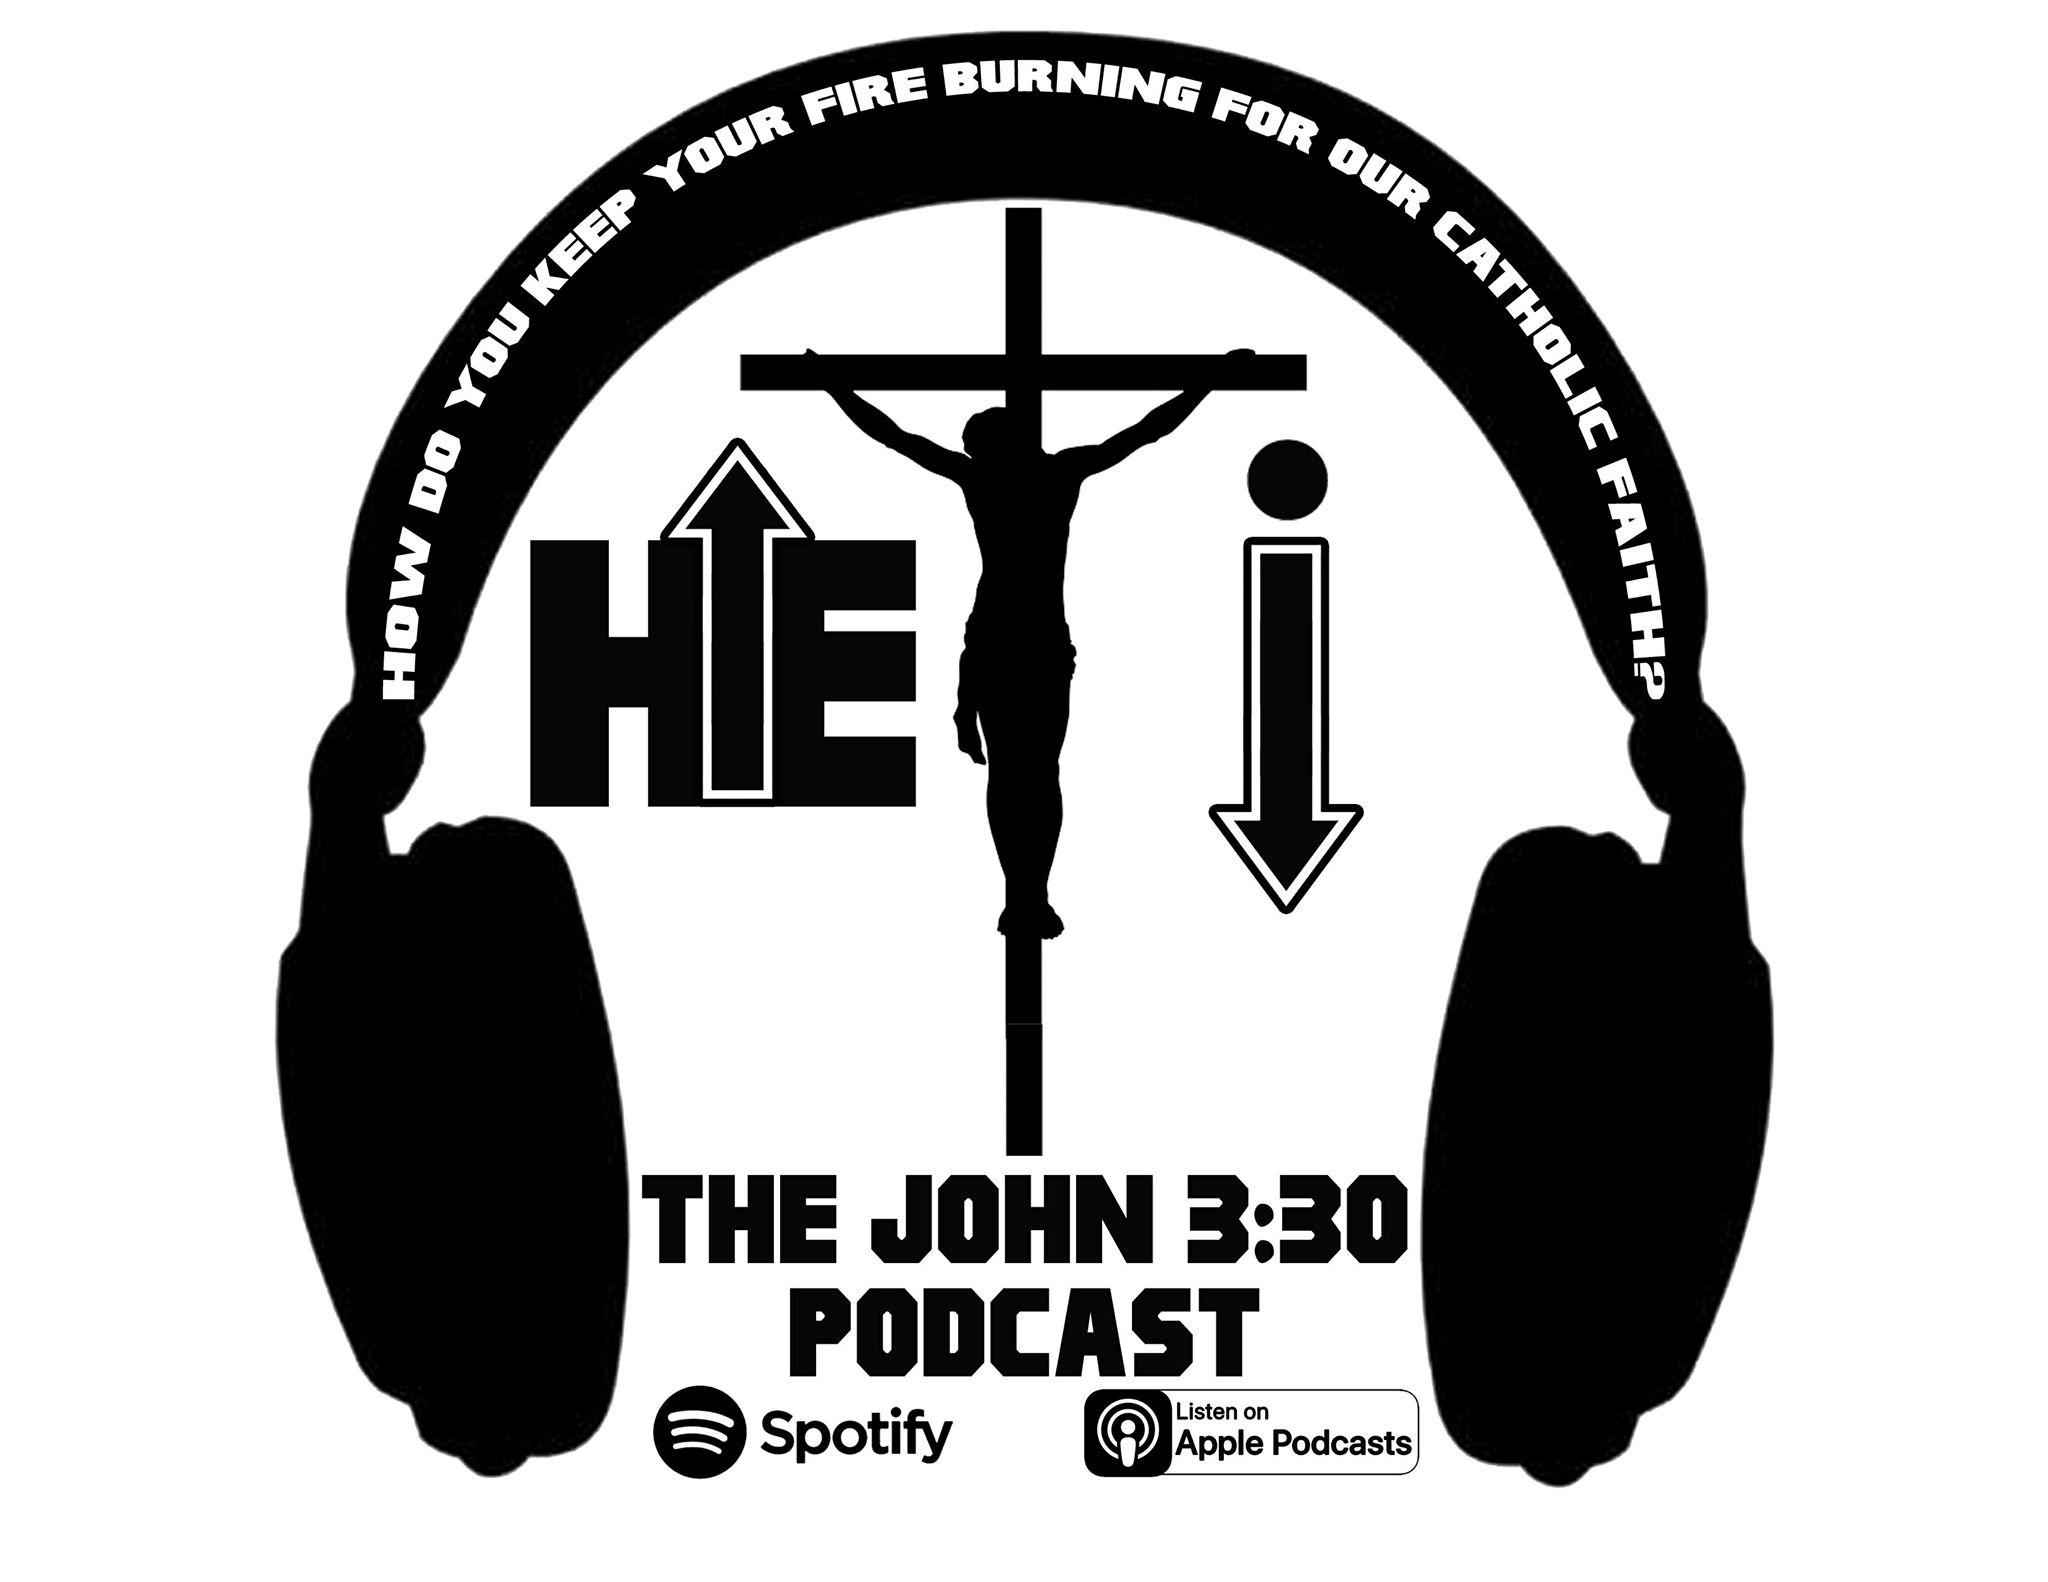 The John 3:30 Podcast show art